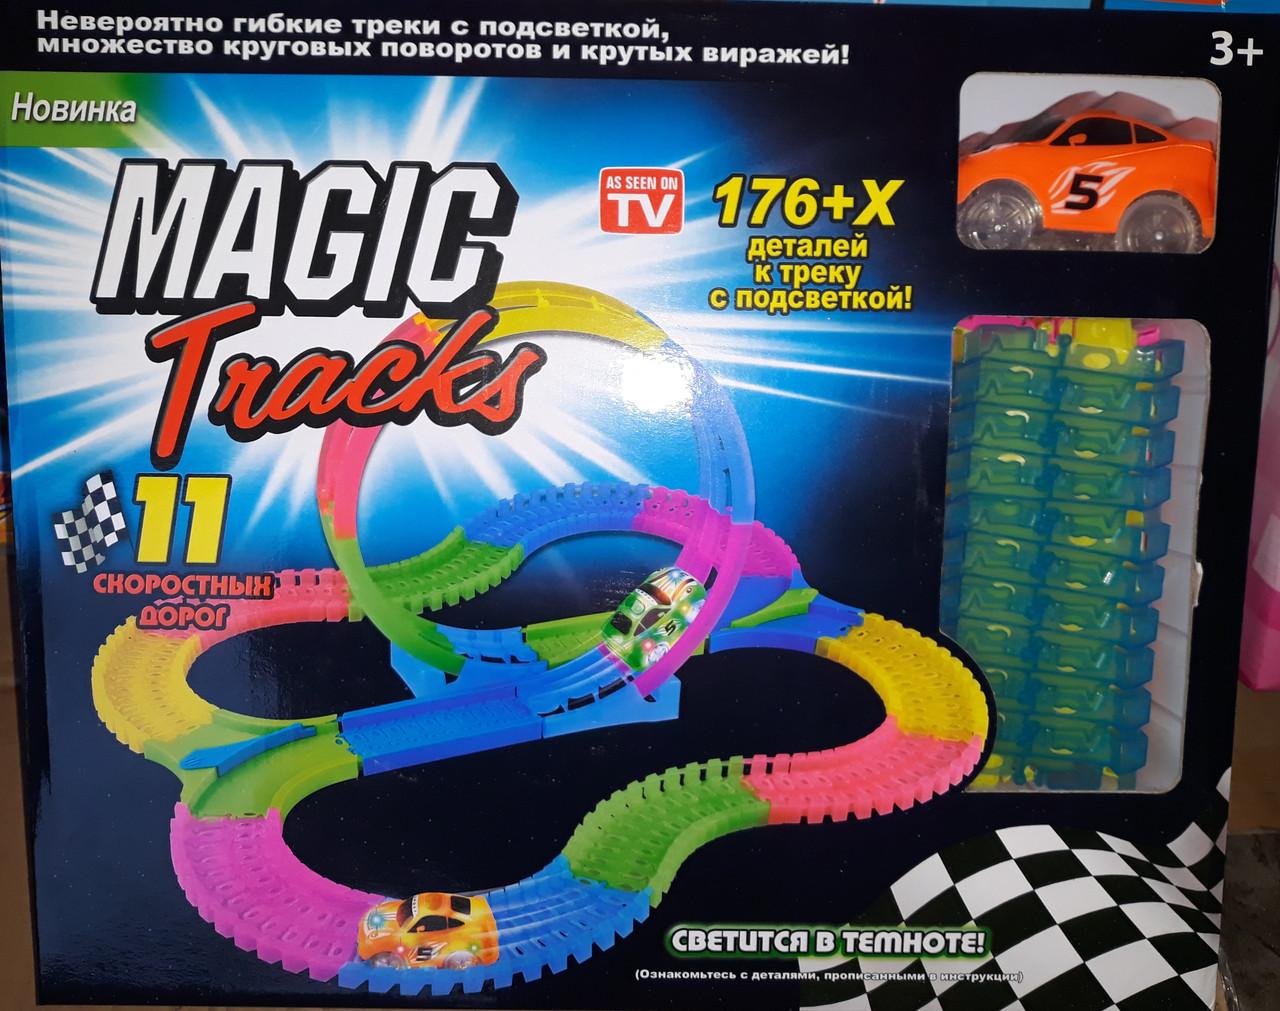 Magic Track 176+X Светится в темноте